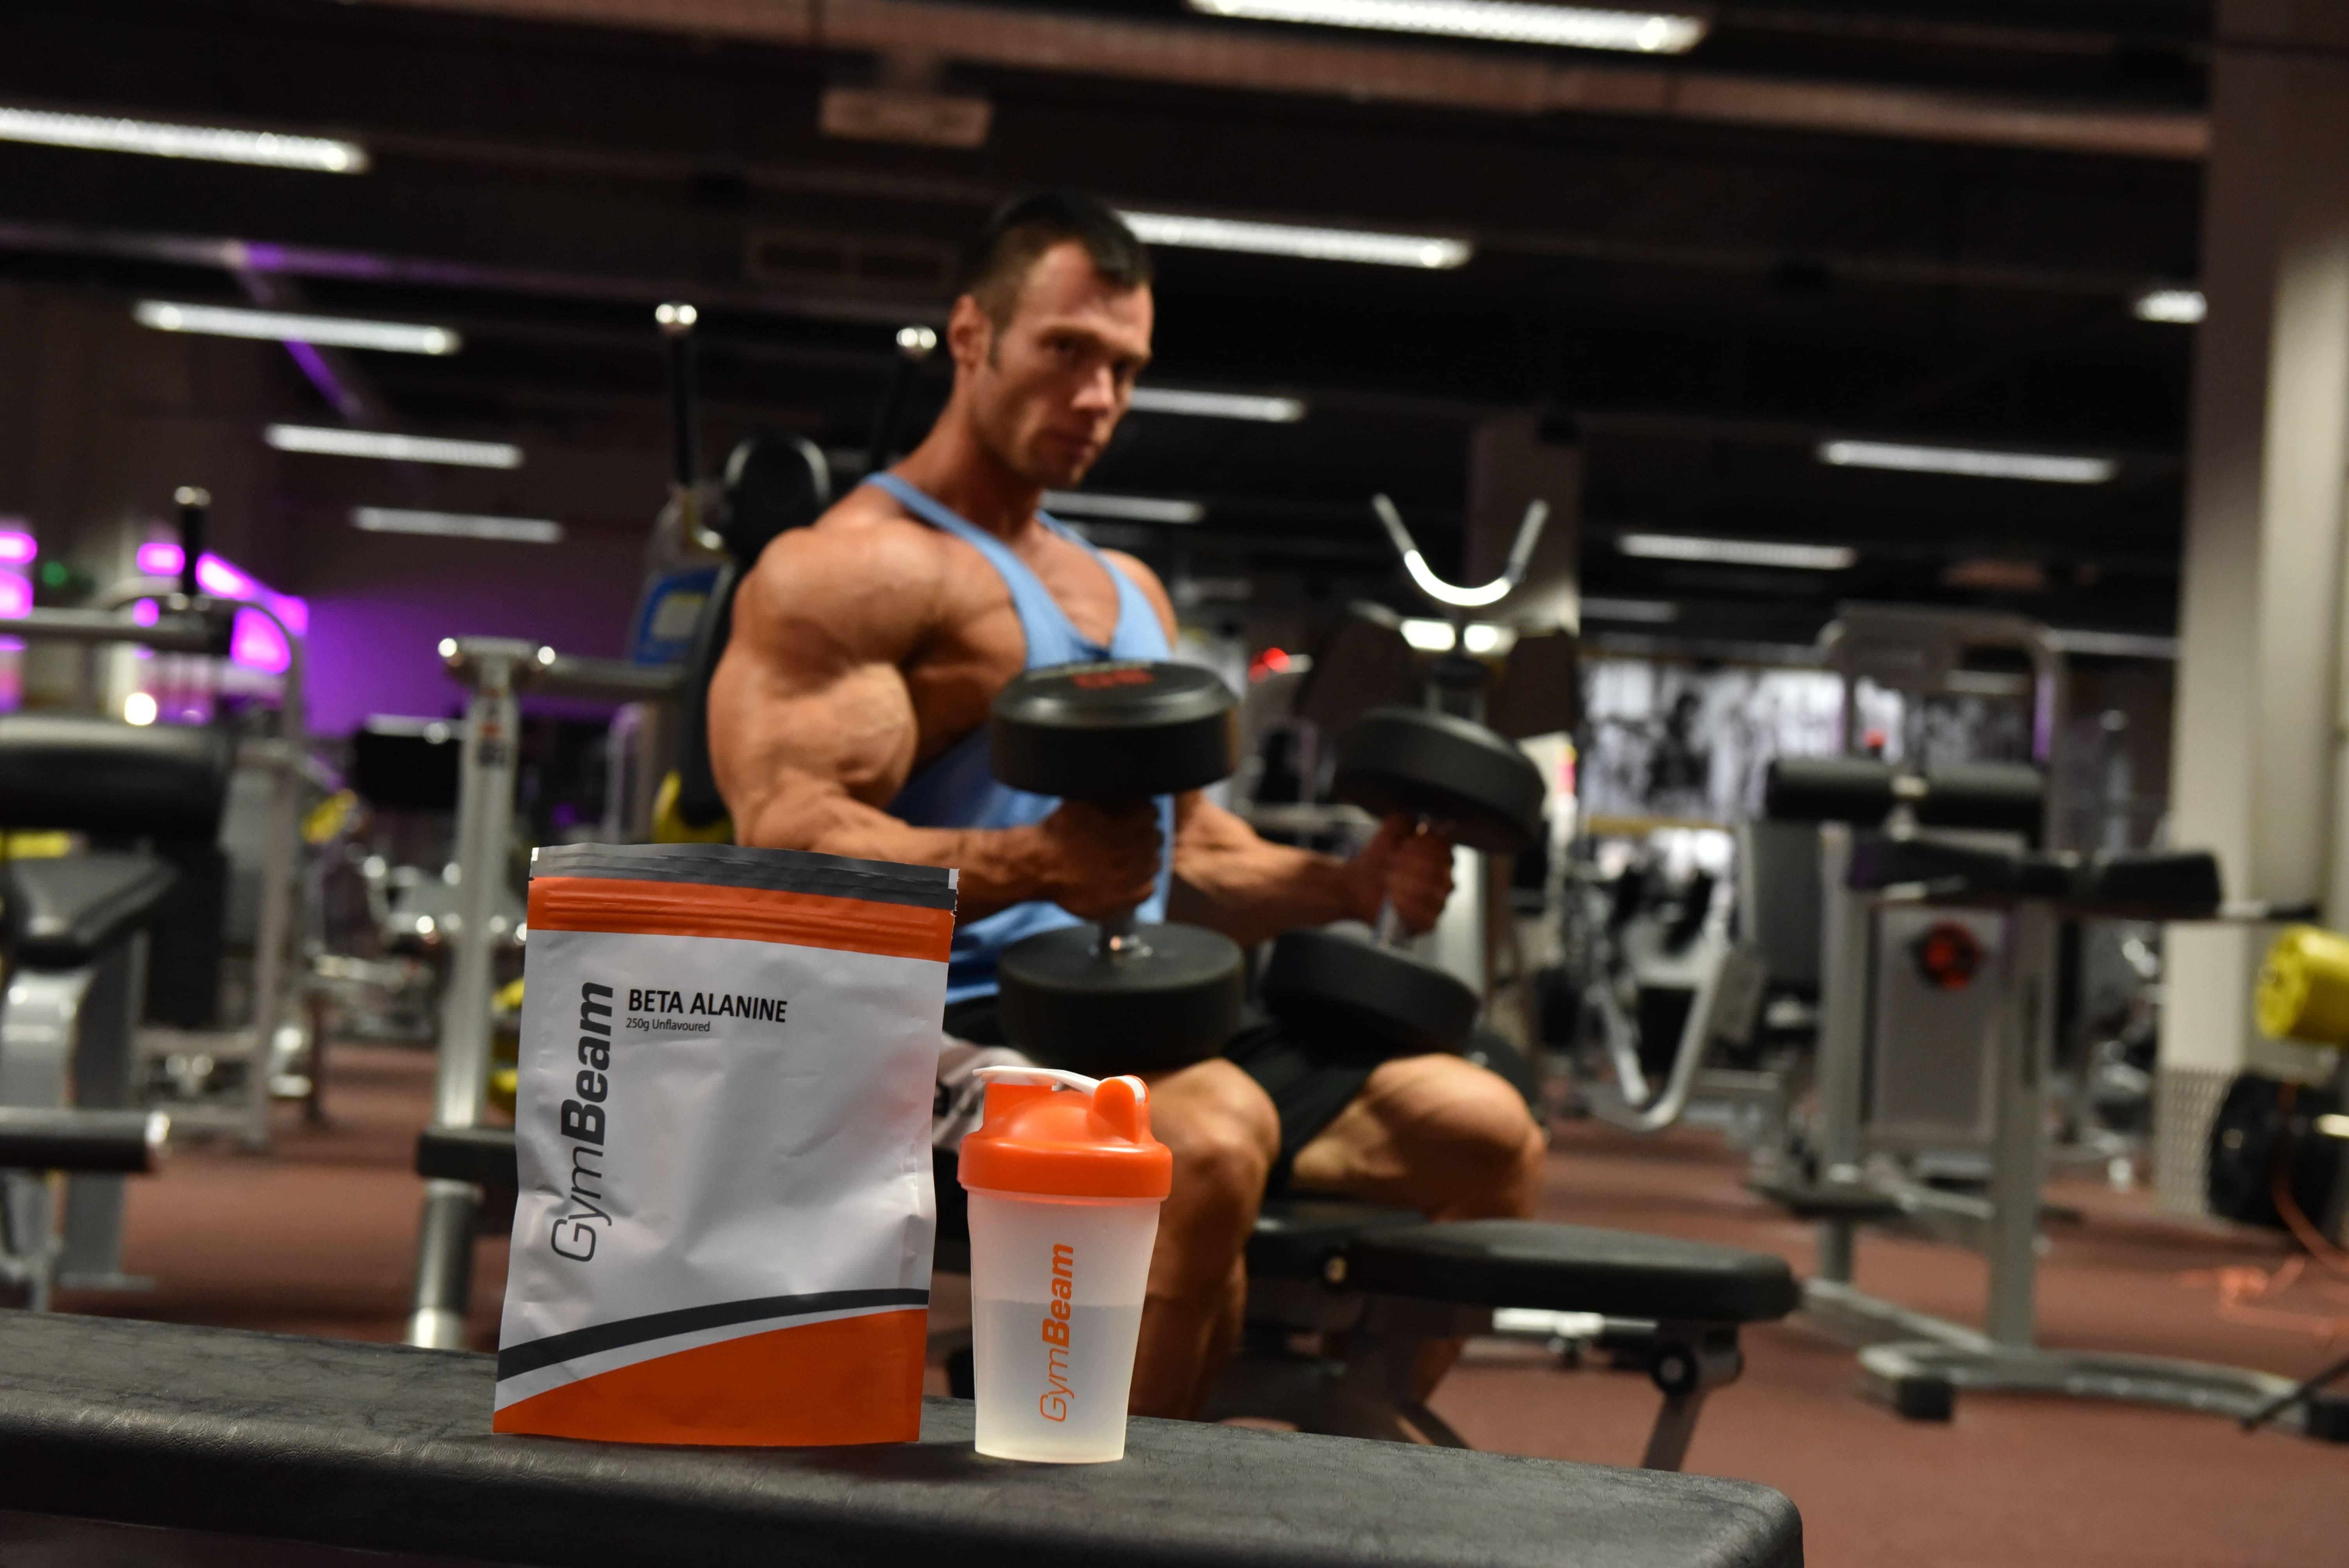 beta alanin bodybuilding